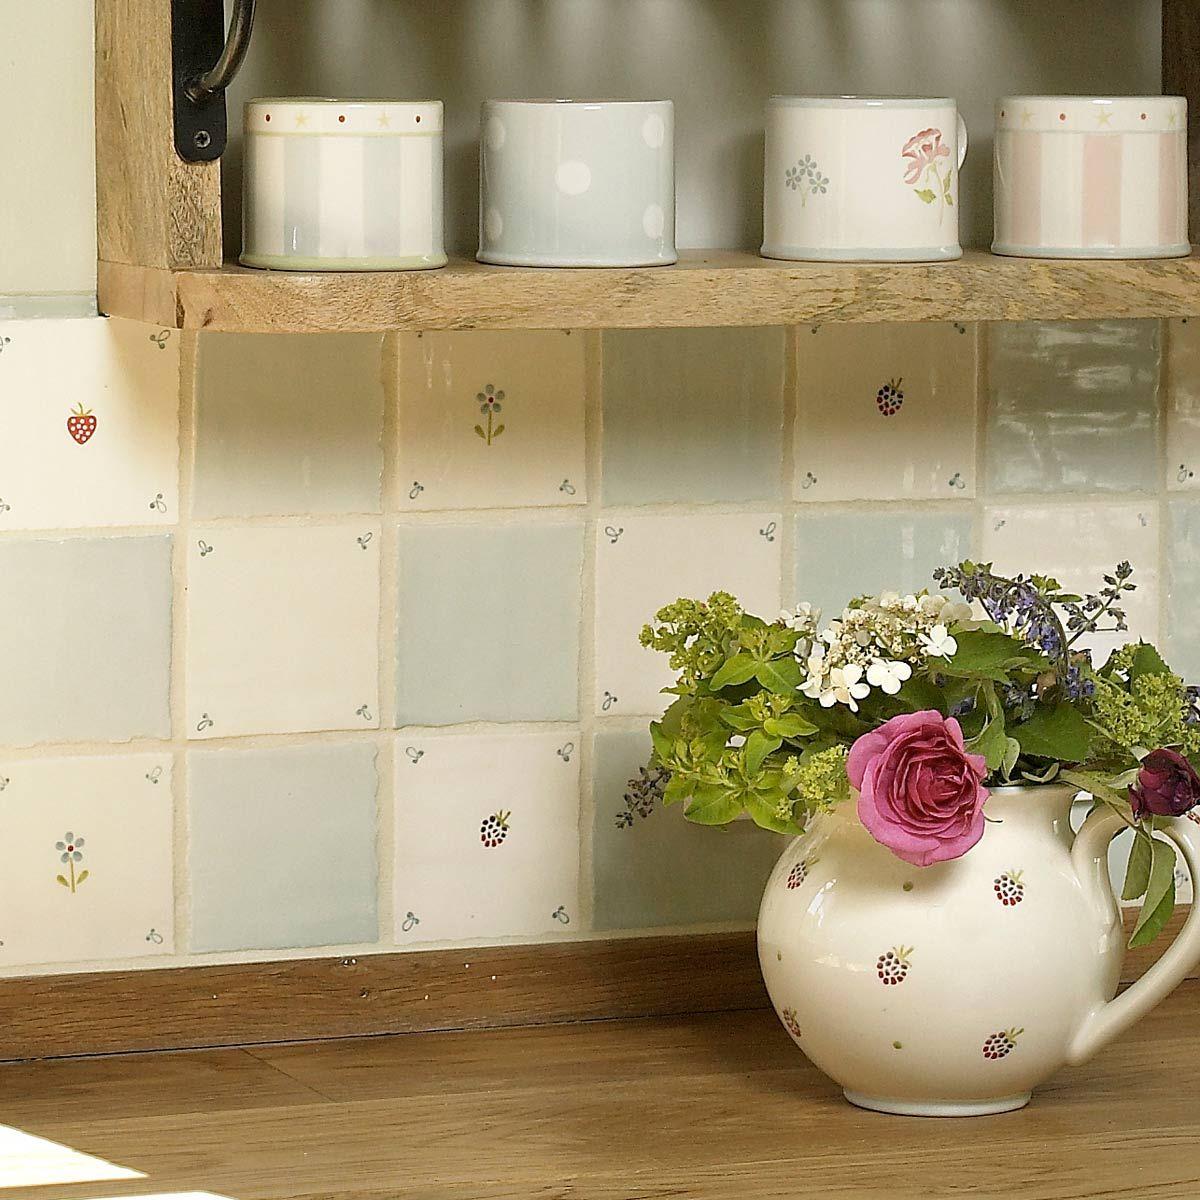 Duck Egg Blue Tile Susie Watson Designs Cottage Kitchen Tiles